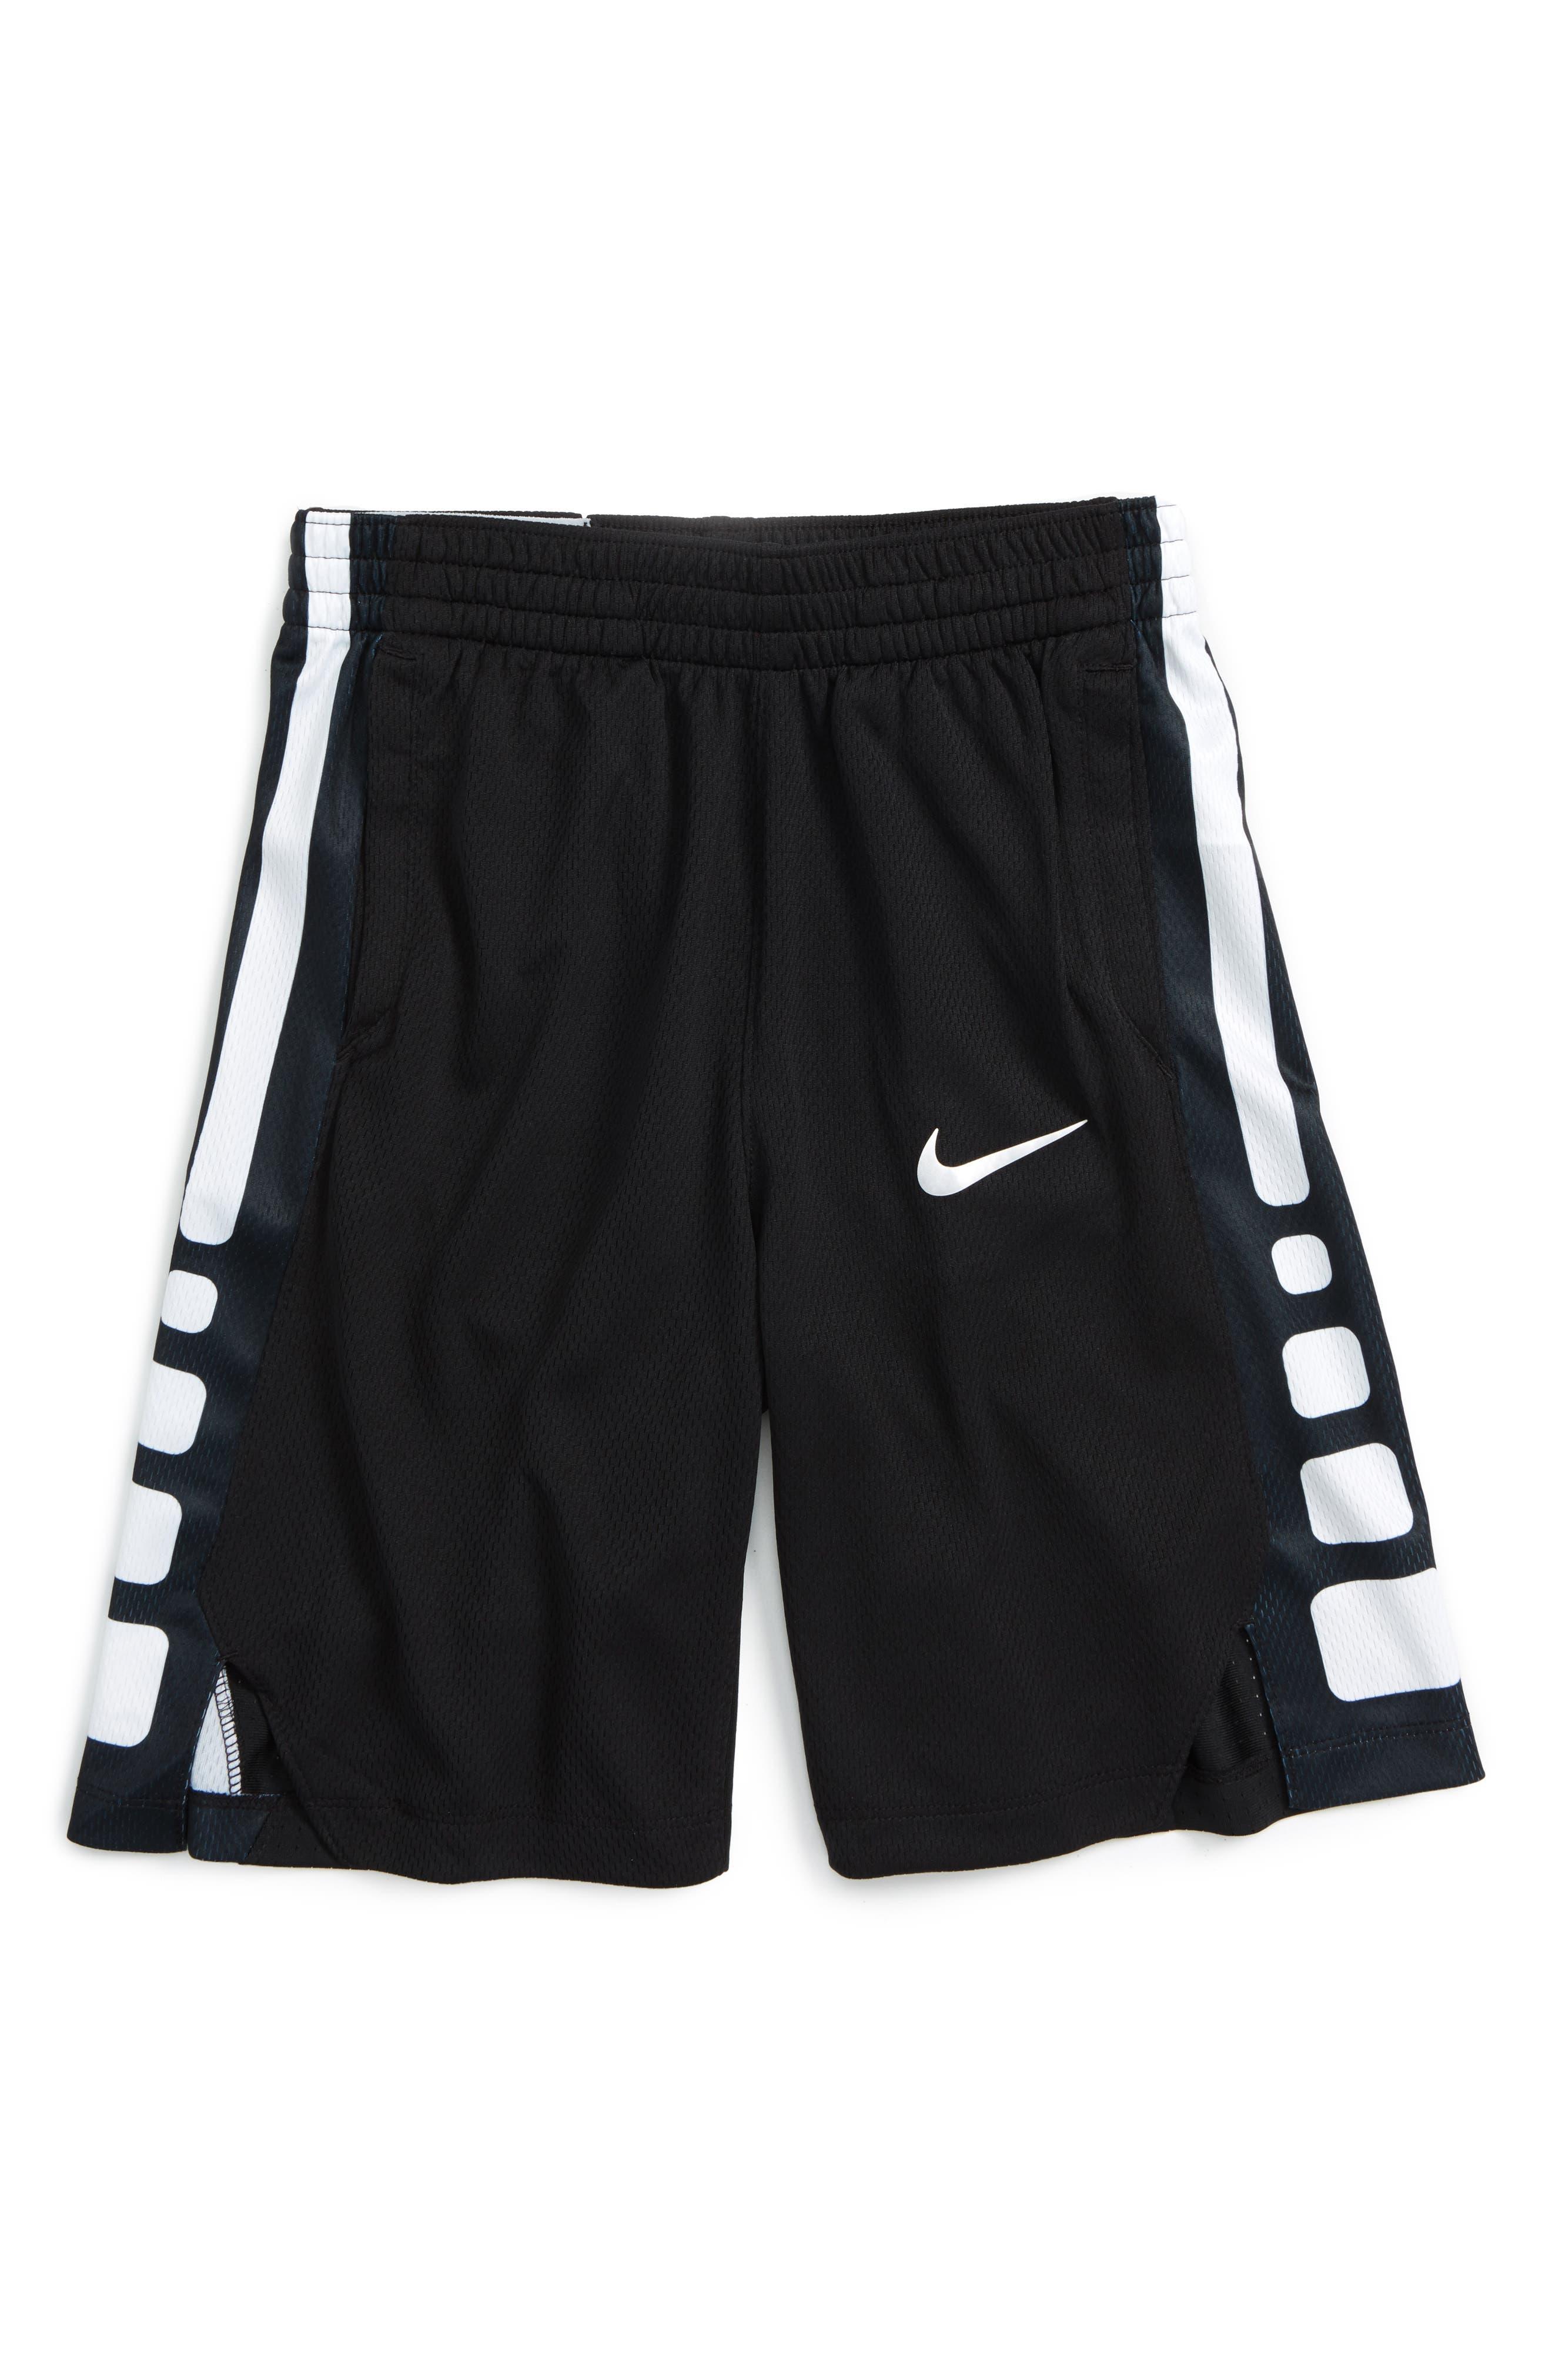 Nike jackets cheap - Nike Jackets Cheap 29